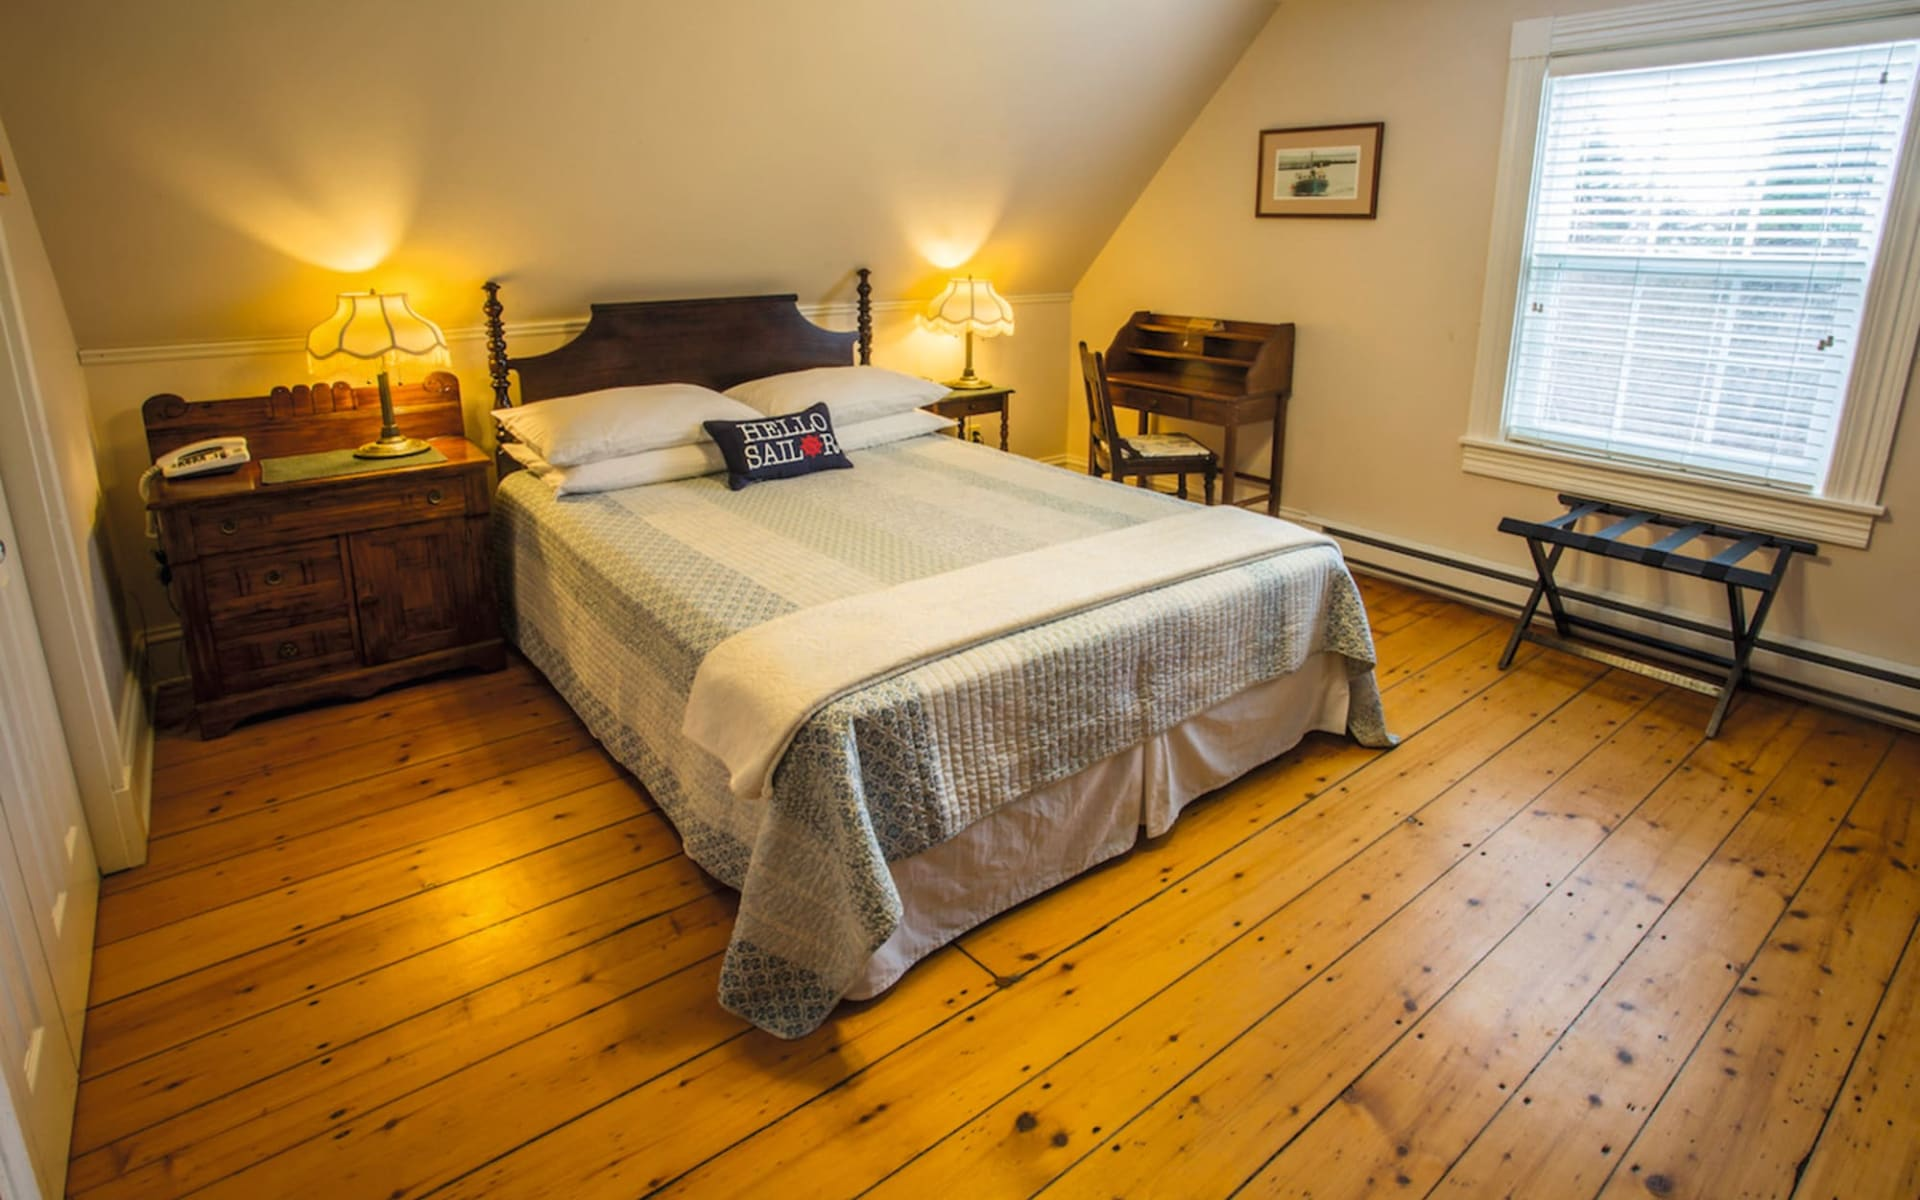 Innisfree Bed and Breakfast in Hopewell Cape:  Innisfree B&B_Hopecall Rocks_Harringto Cove Zimmer